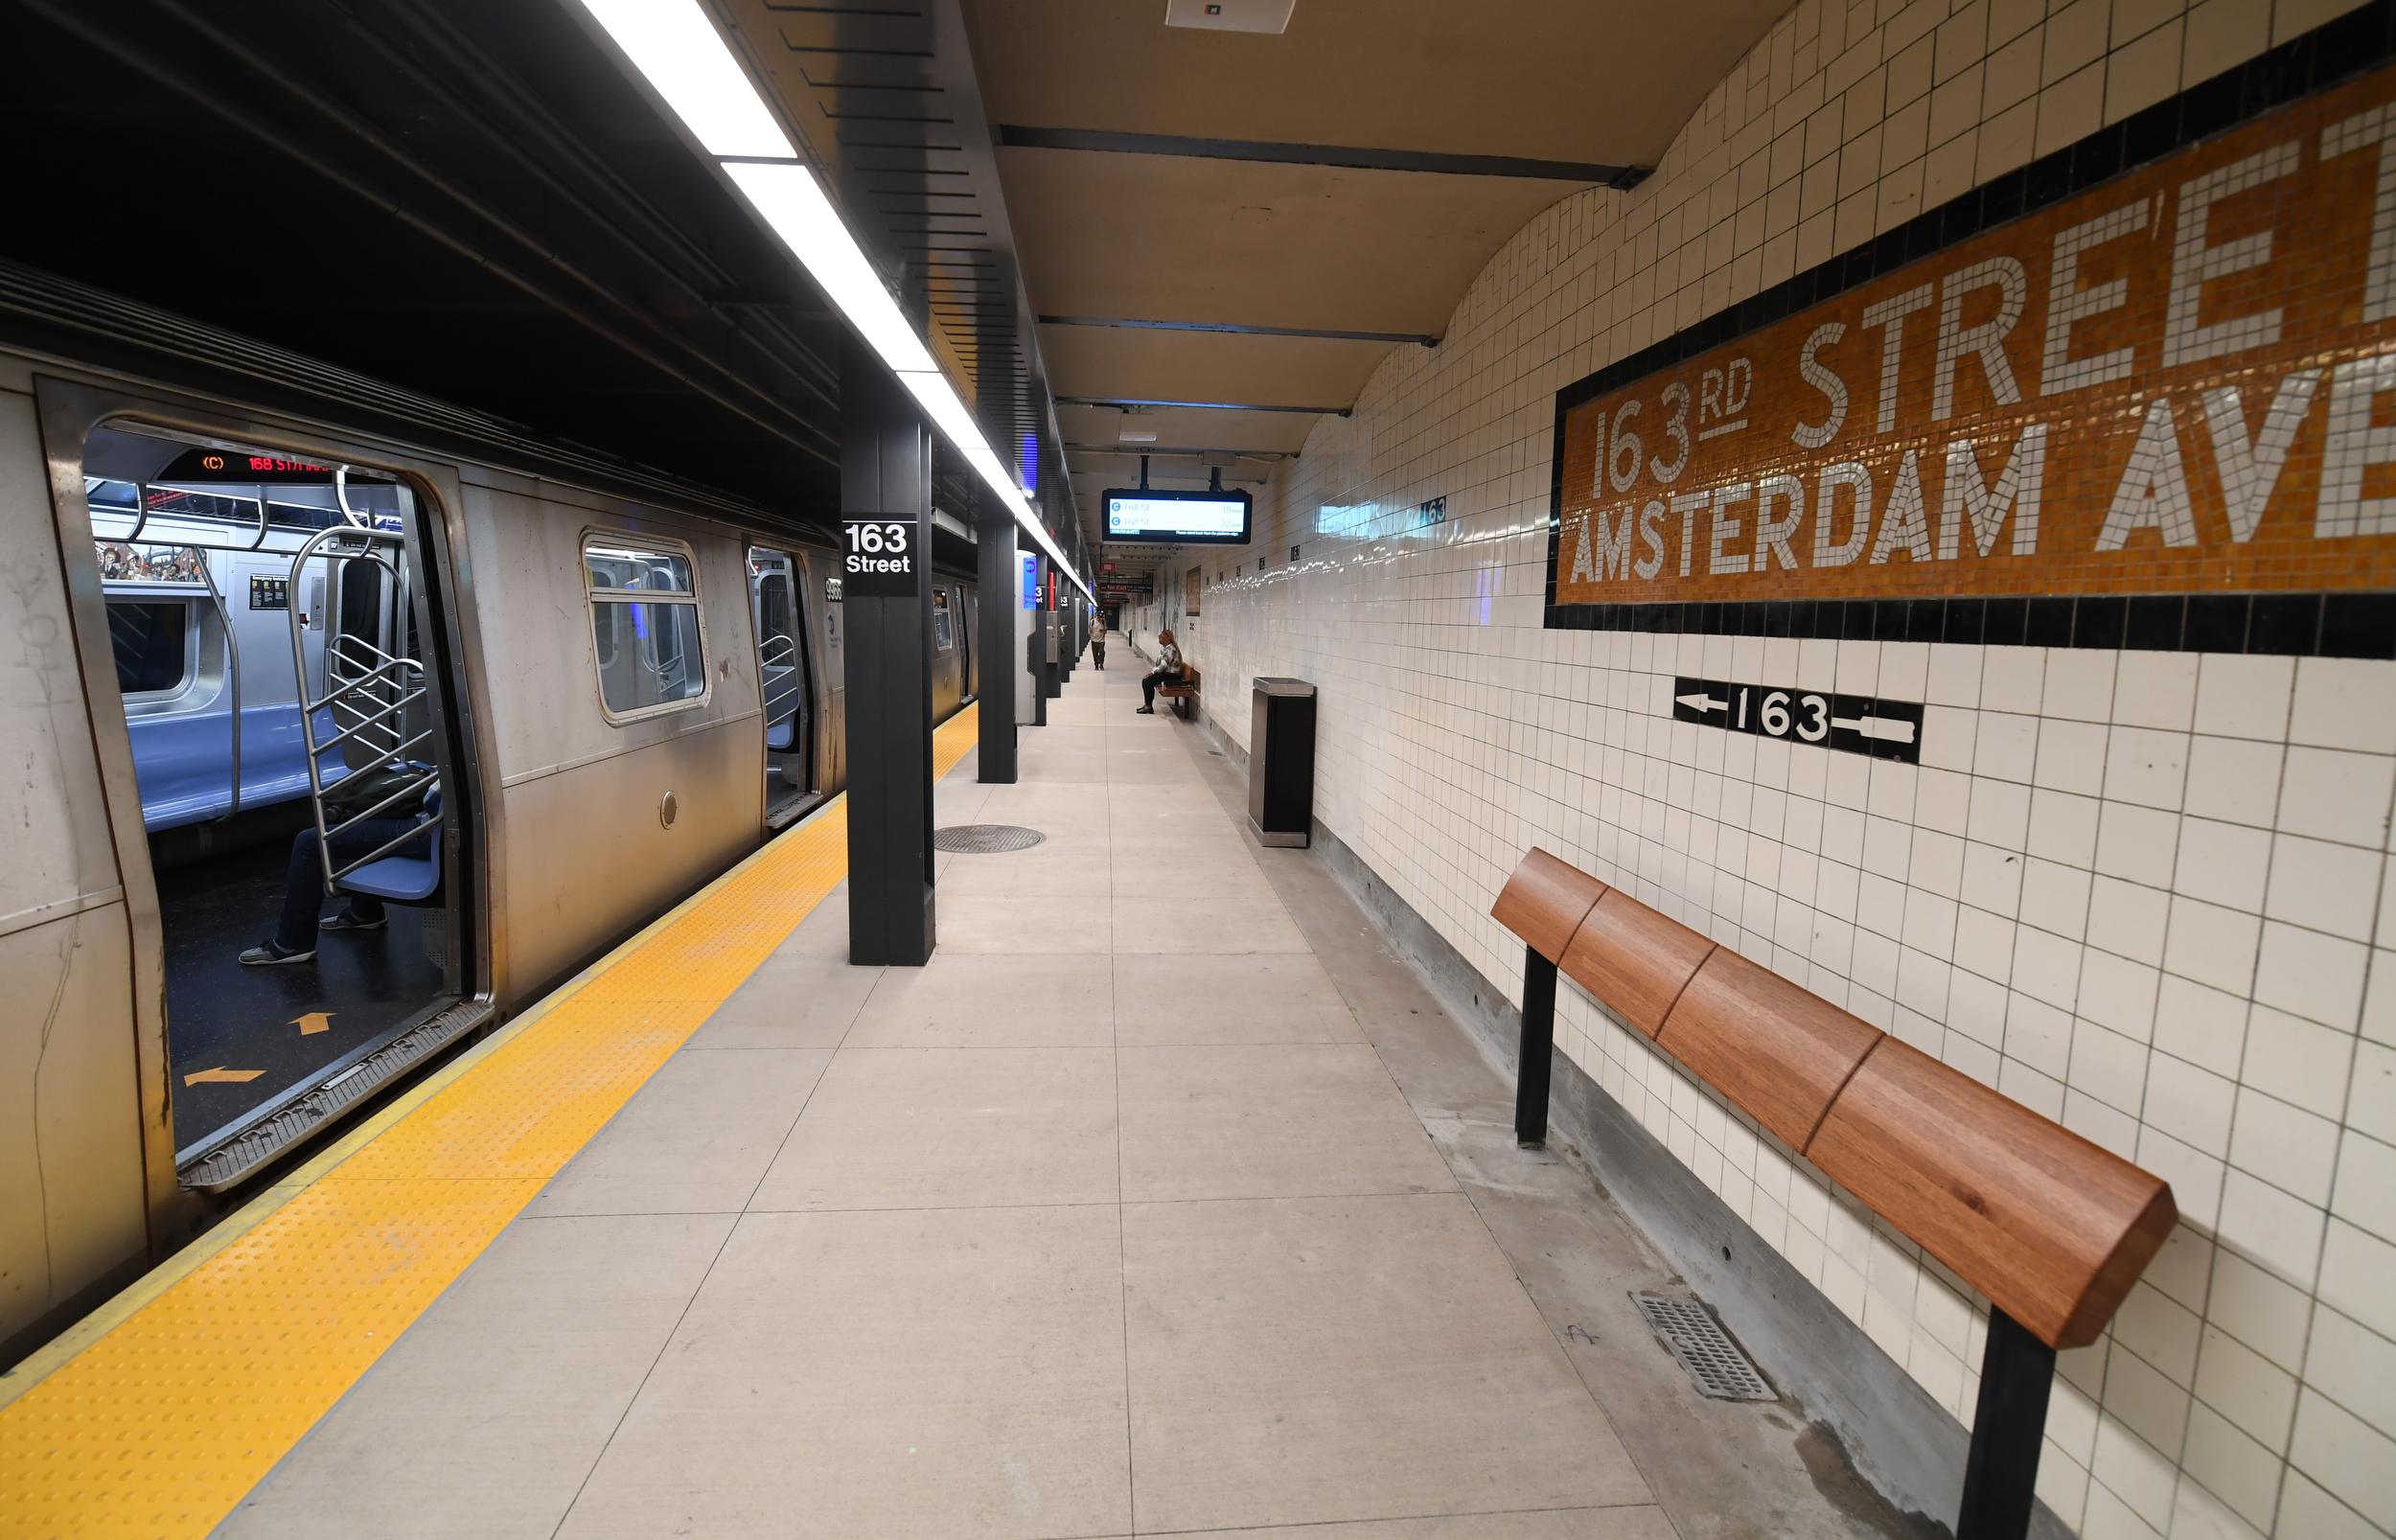 72nd Street Subway Map.163rd Street Amsterdam Avenue Station Wikipedia